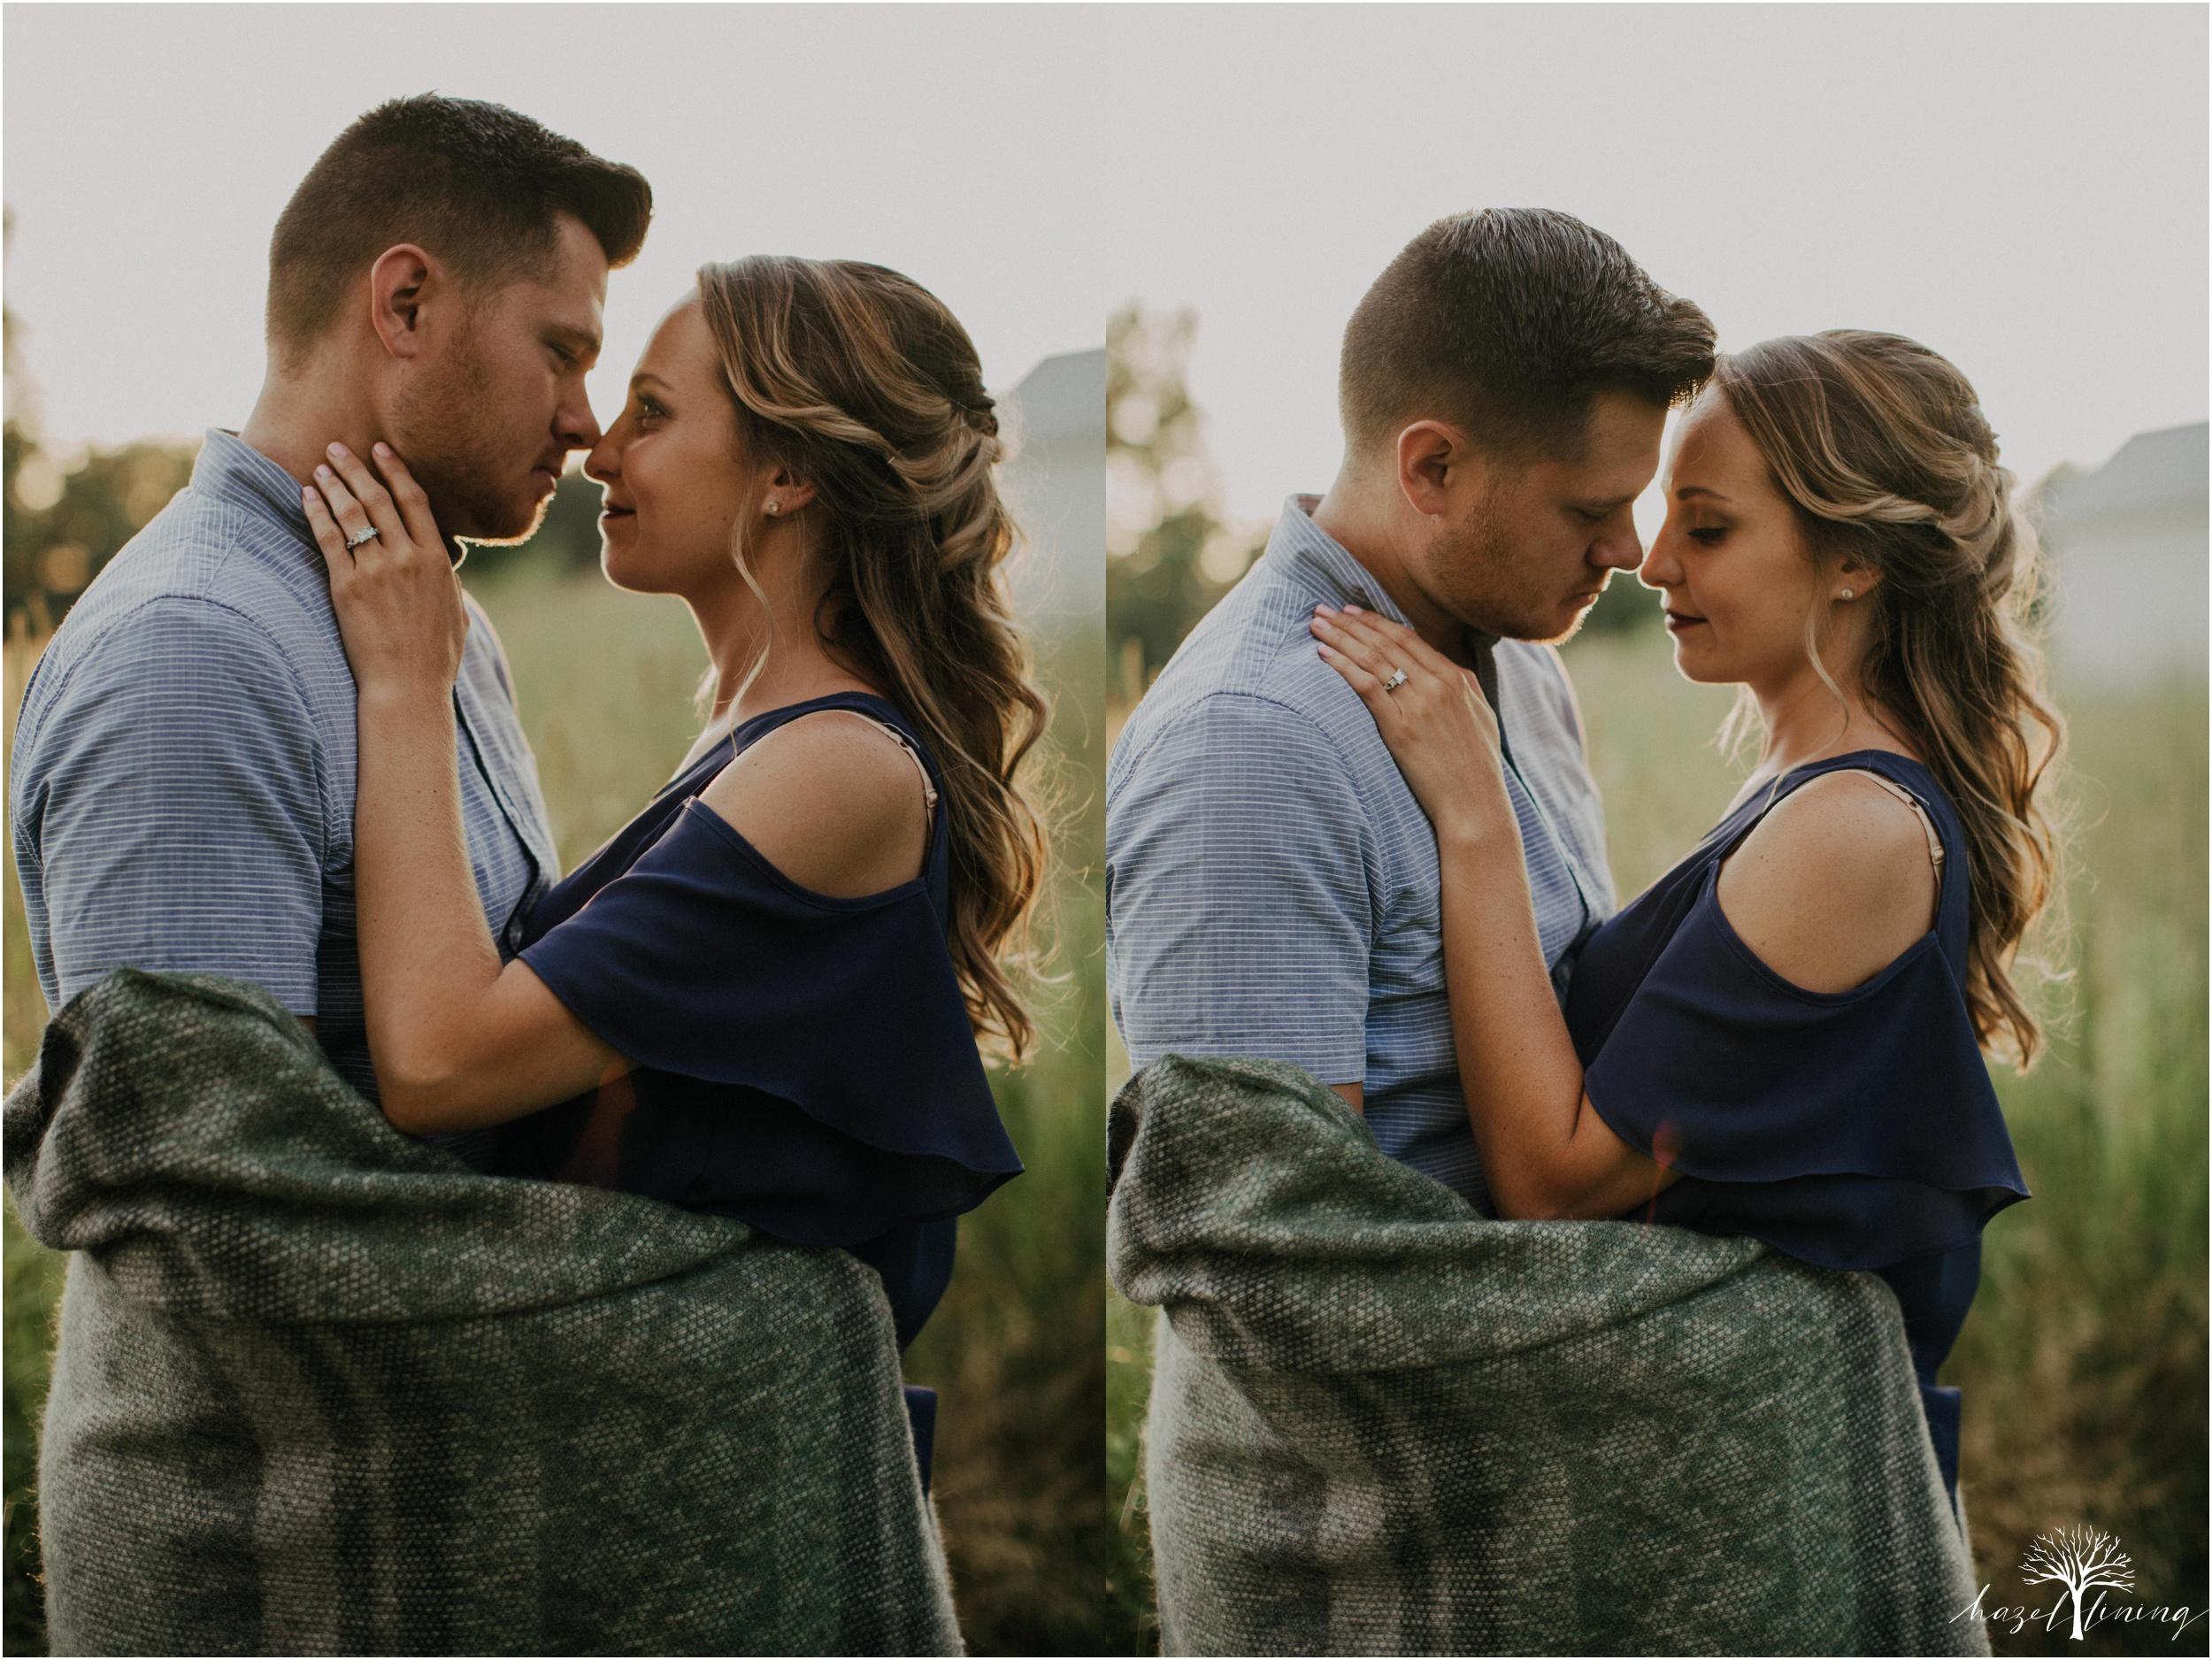 rachel-warner-chris-niedrist-the-farm-bakery-and-events-quakertown-pa-summer-engagement-hazel-lining-photography-destination-elopement-wedding-engagement-photography_0080.jpg